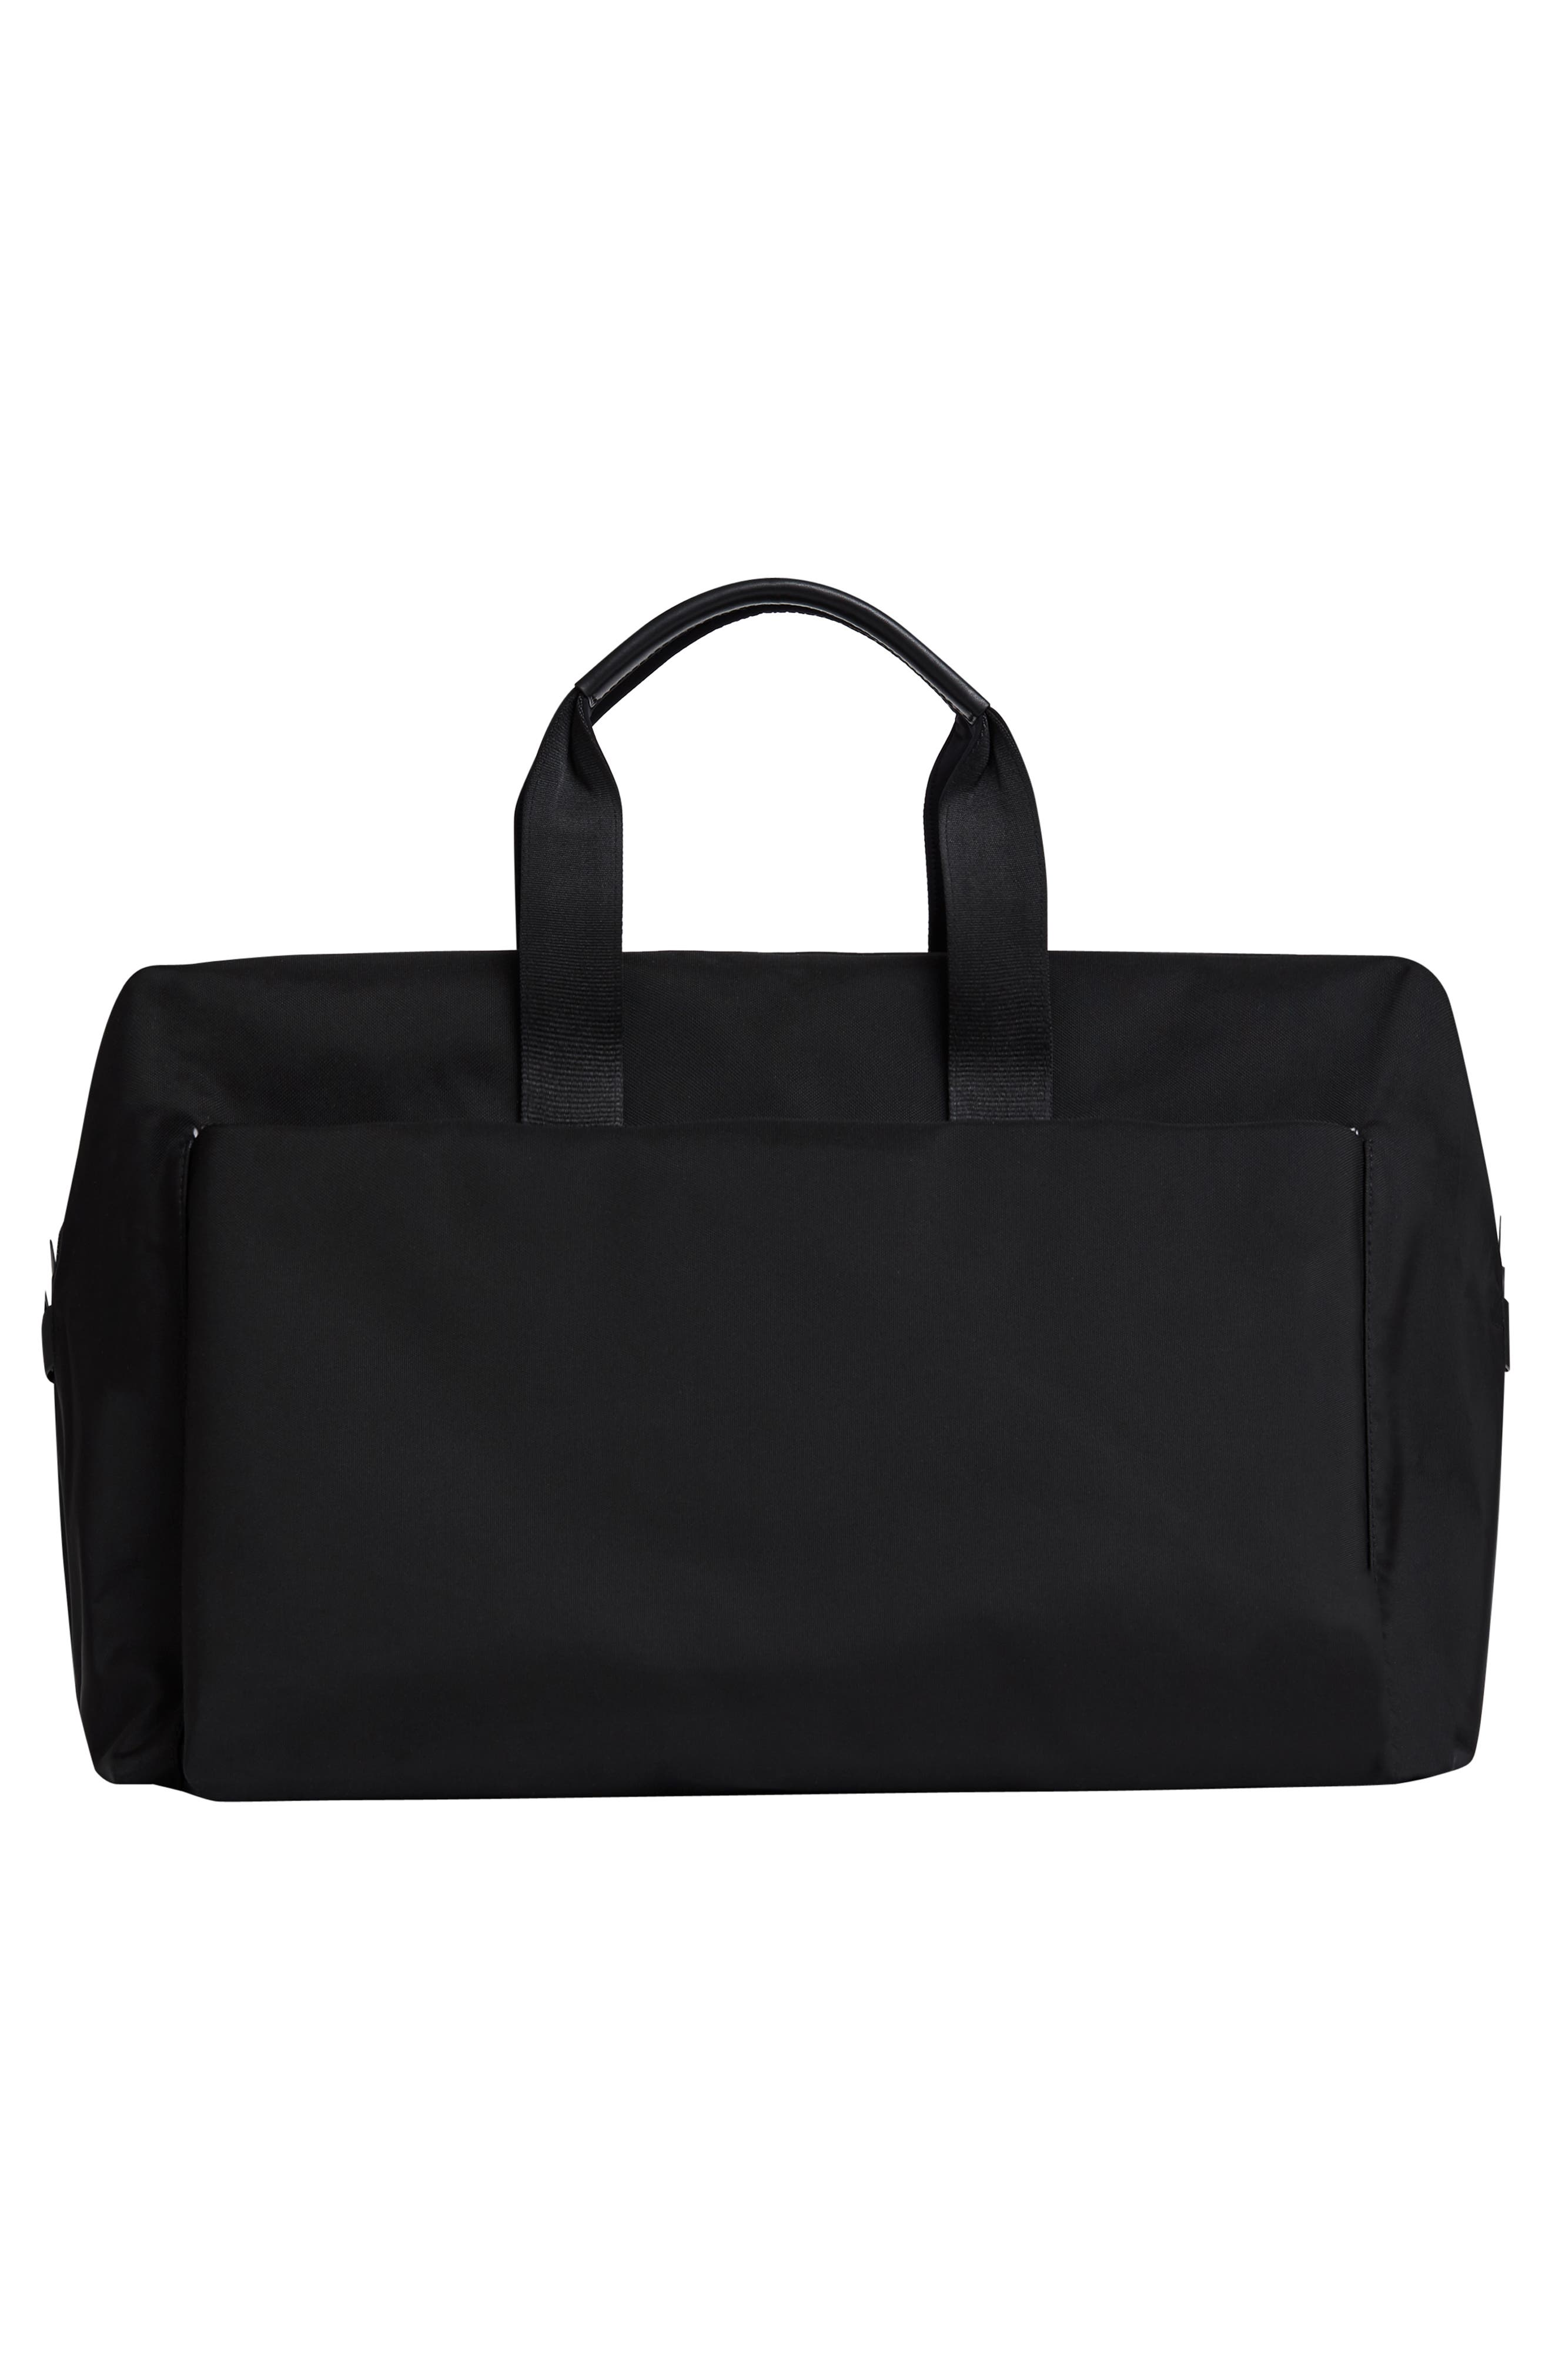 Lightweight Duffel Bag,                             Alternate thumbnail 4, color,                             Black Nylon/ Black Leather